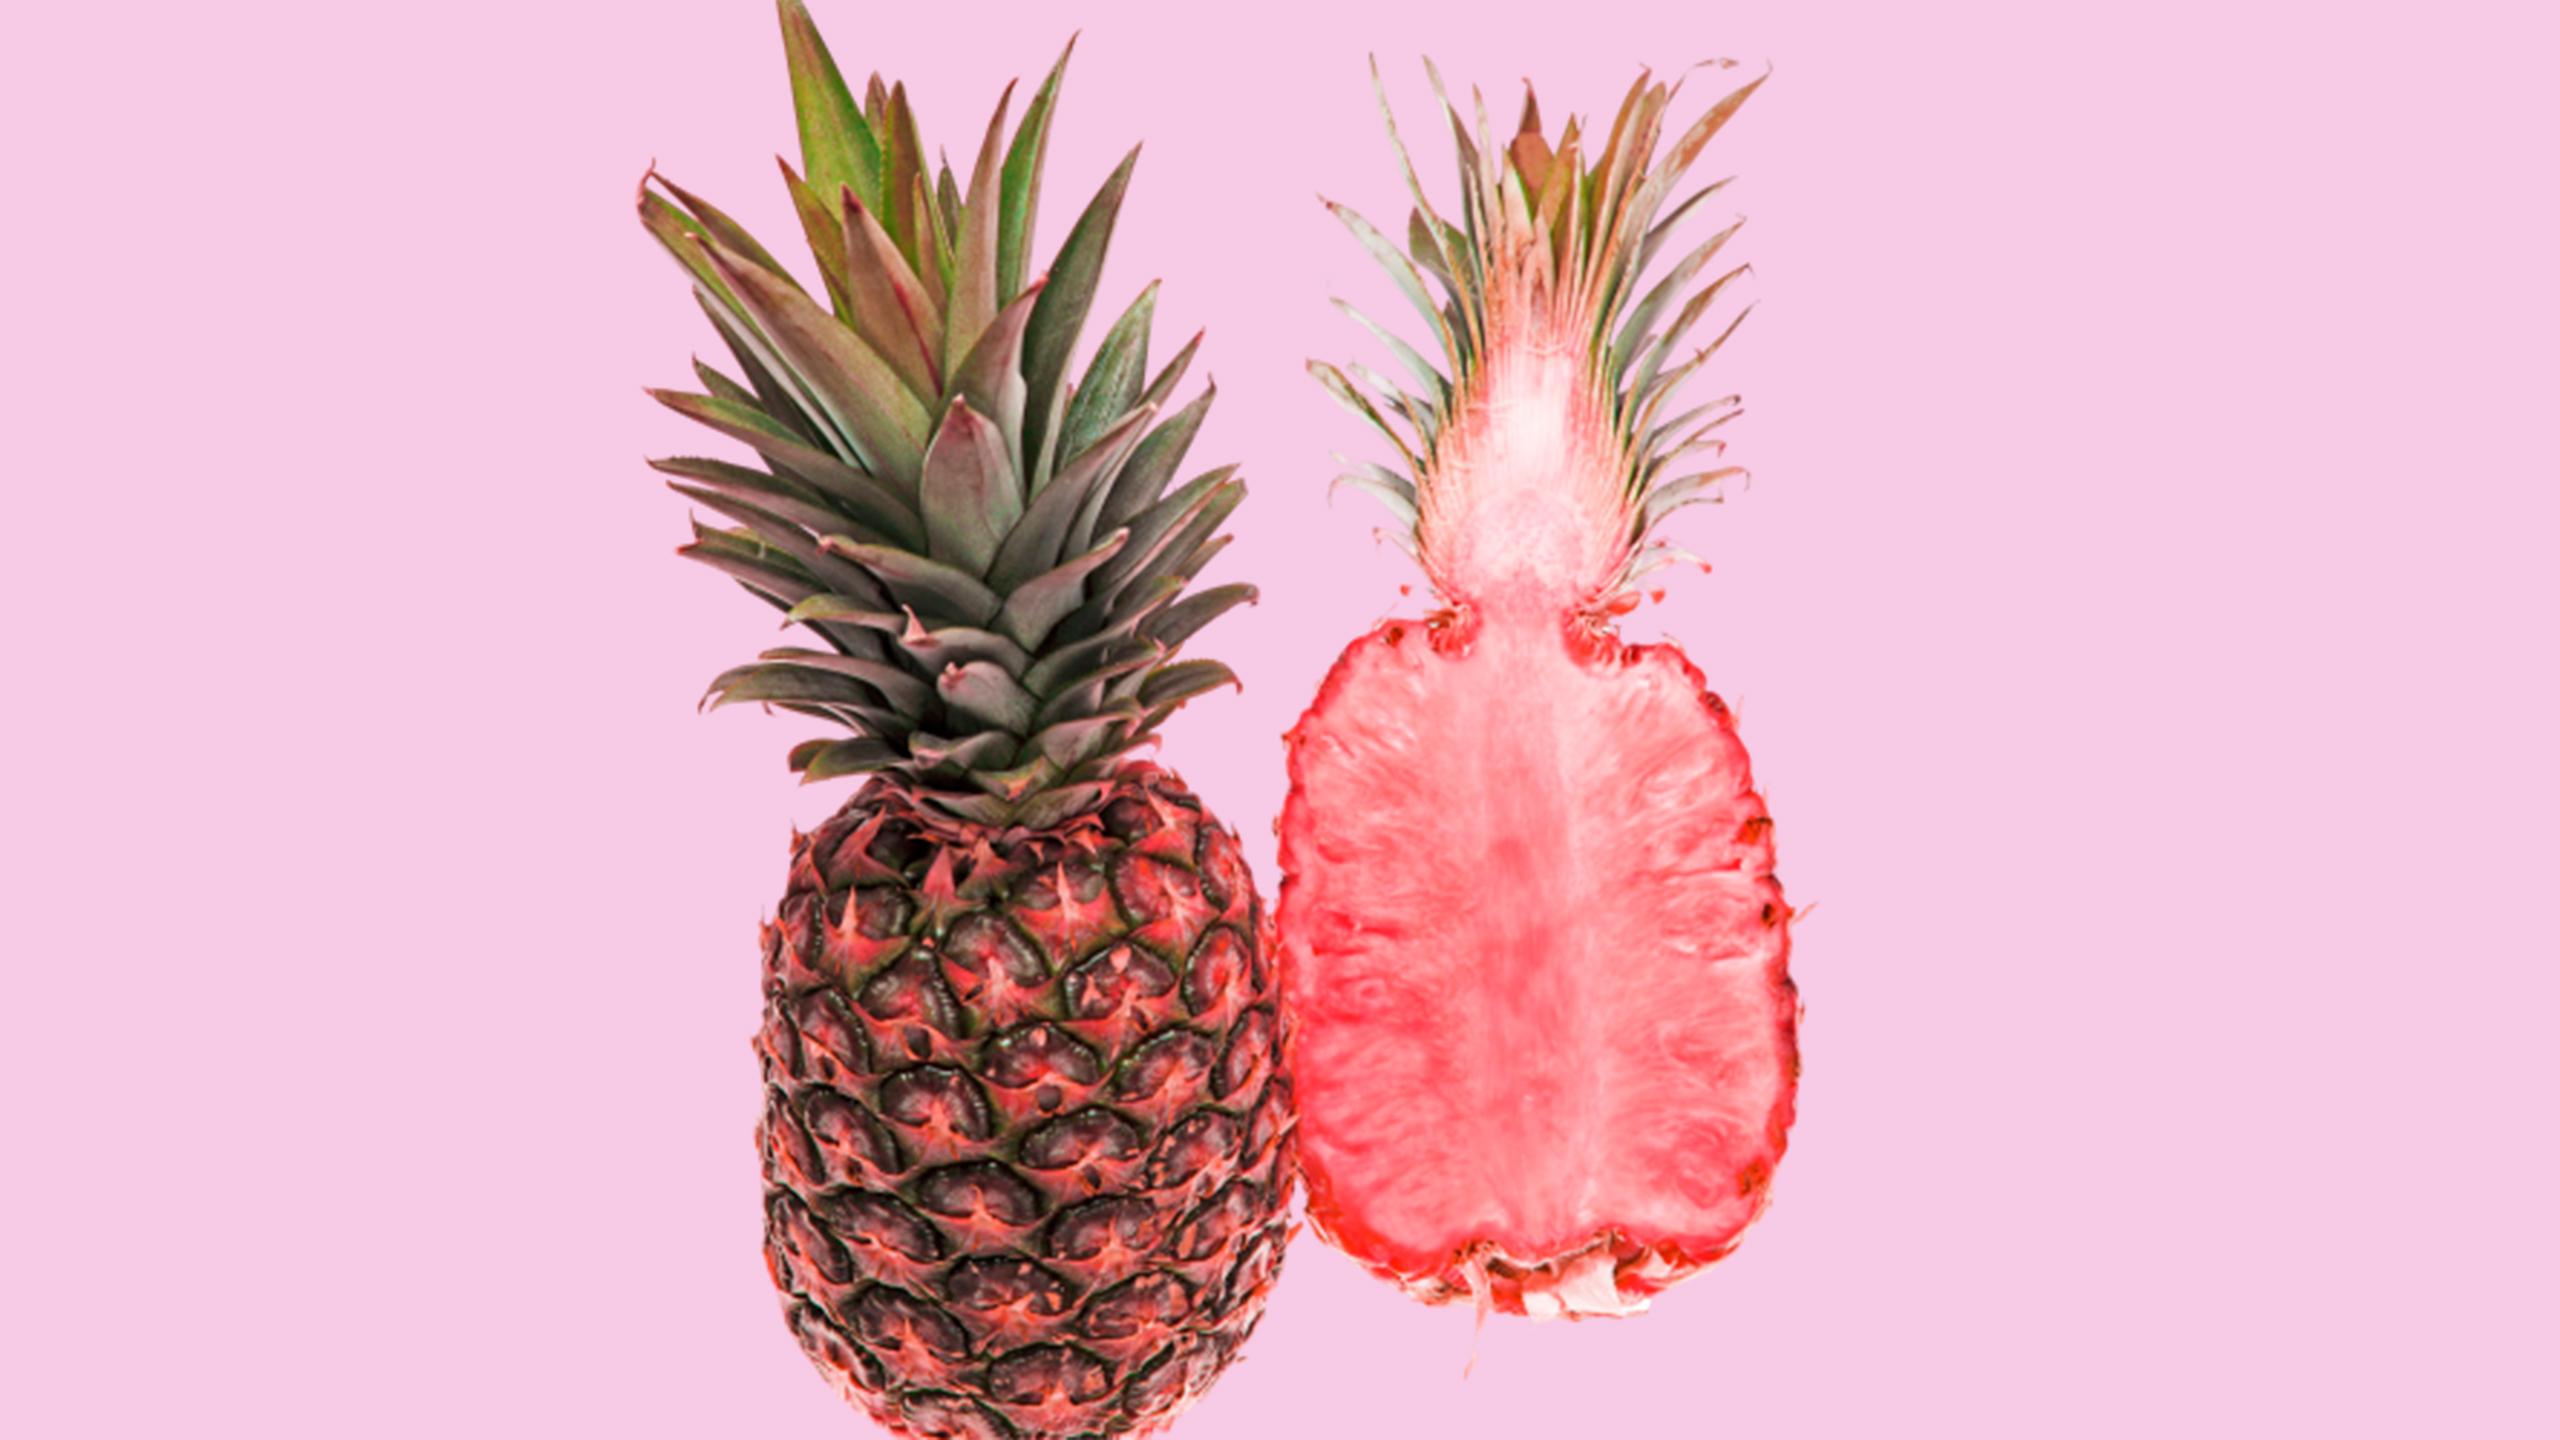 pina-rosada_pink_pineapple